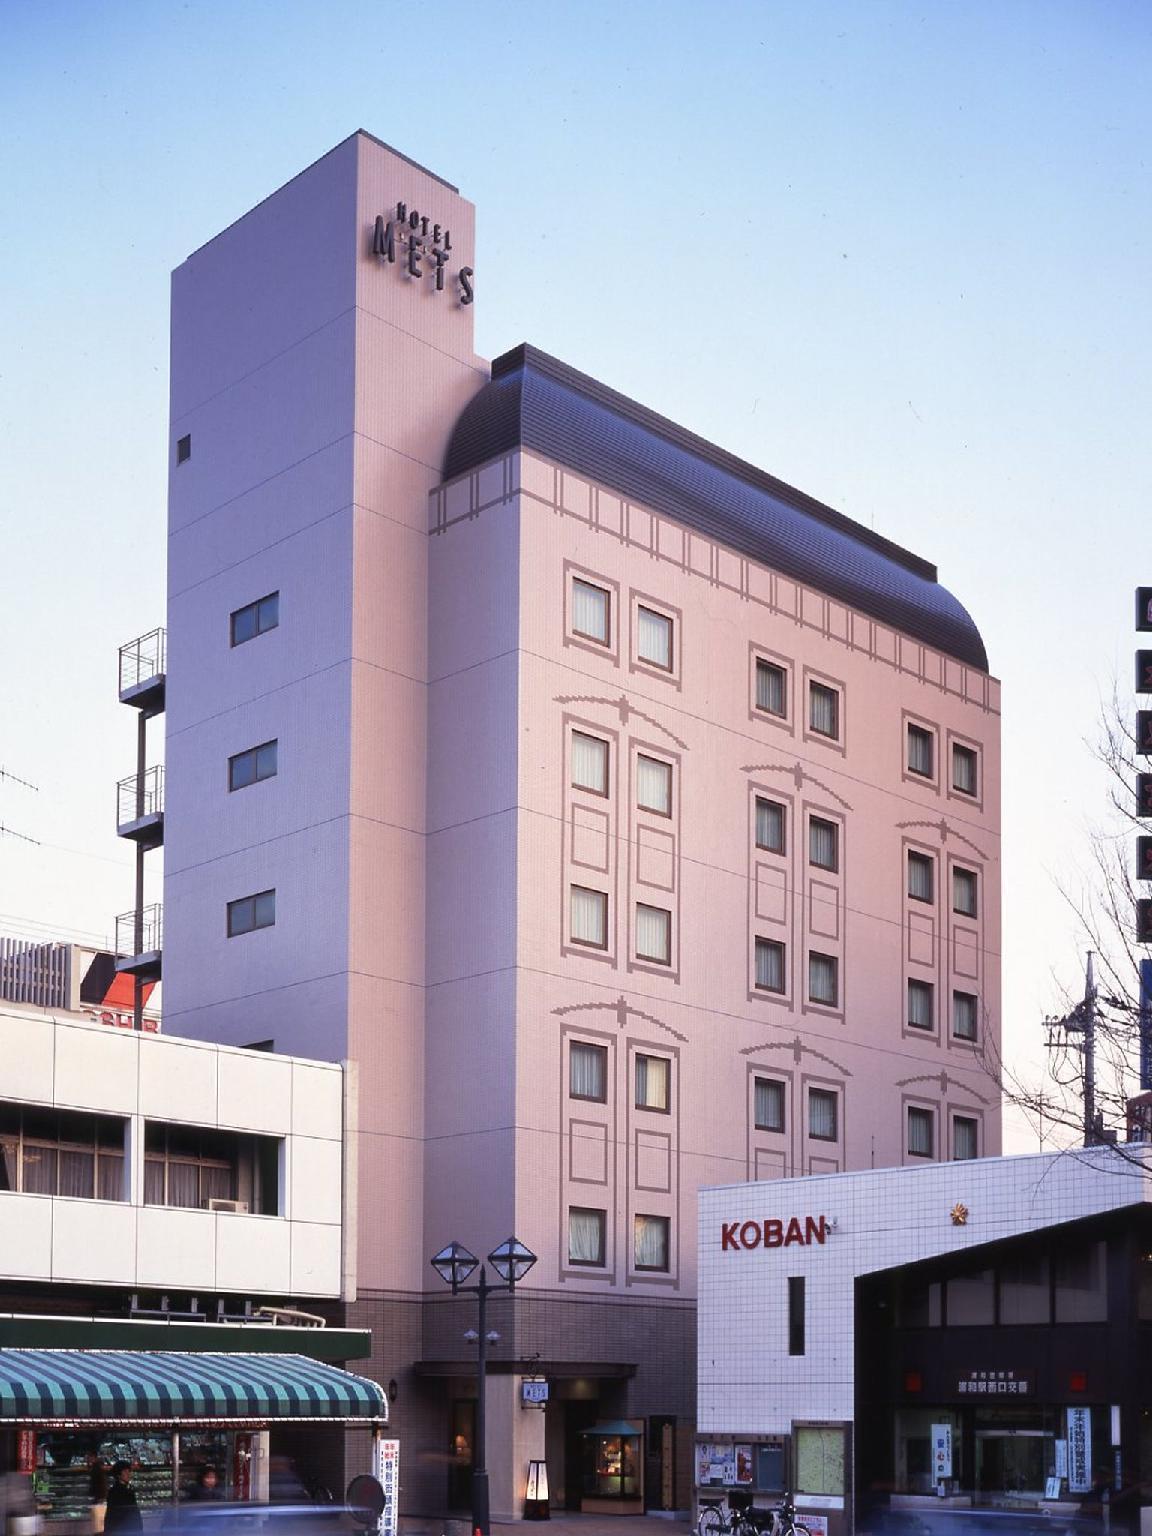 JR EAST HOTEL METS URAWA